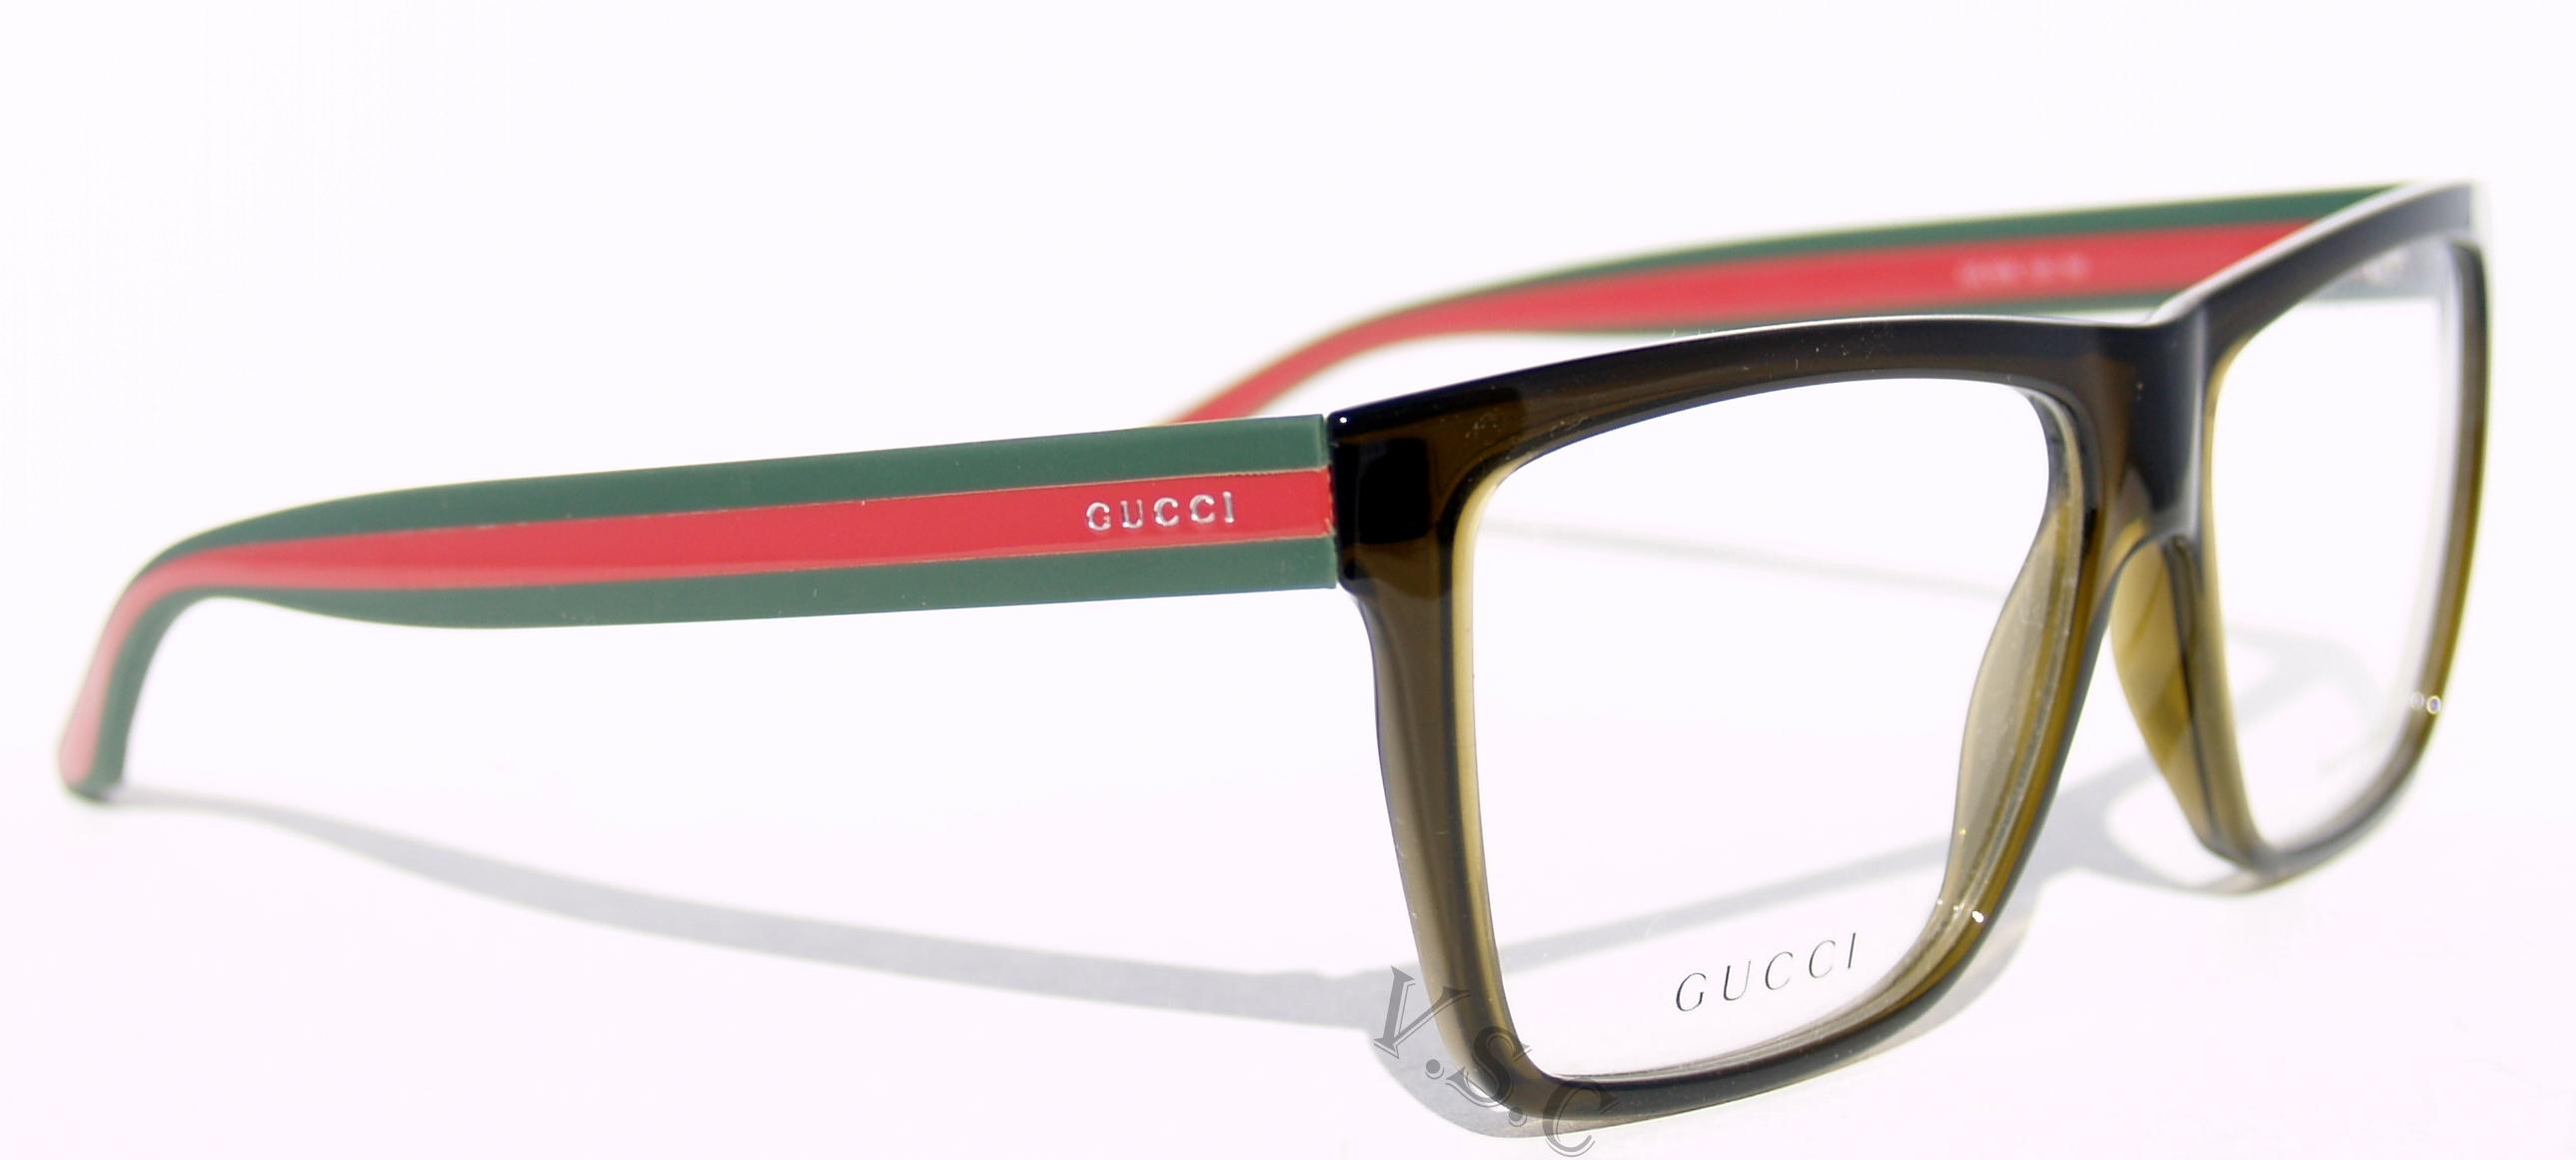 GUCCI 1008 EYEGLASSES GG EYE GLASSES 53U BROWN GREEN RED ...